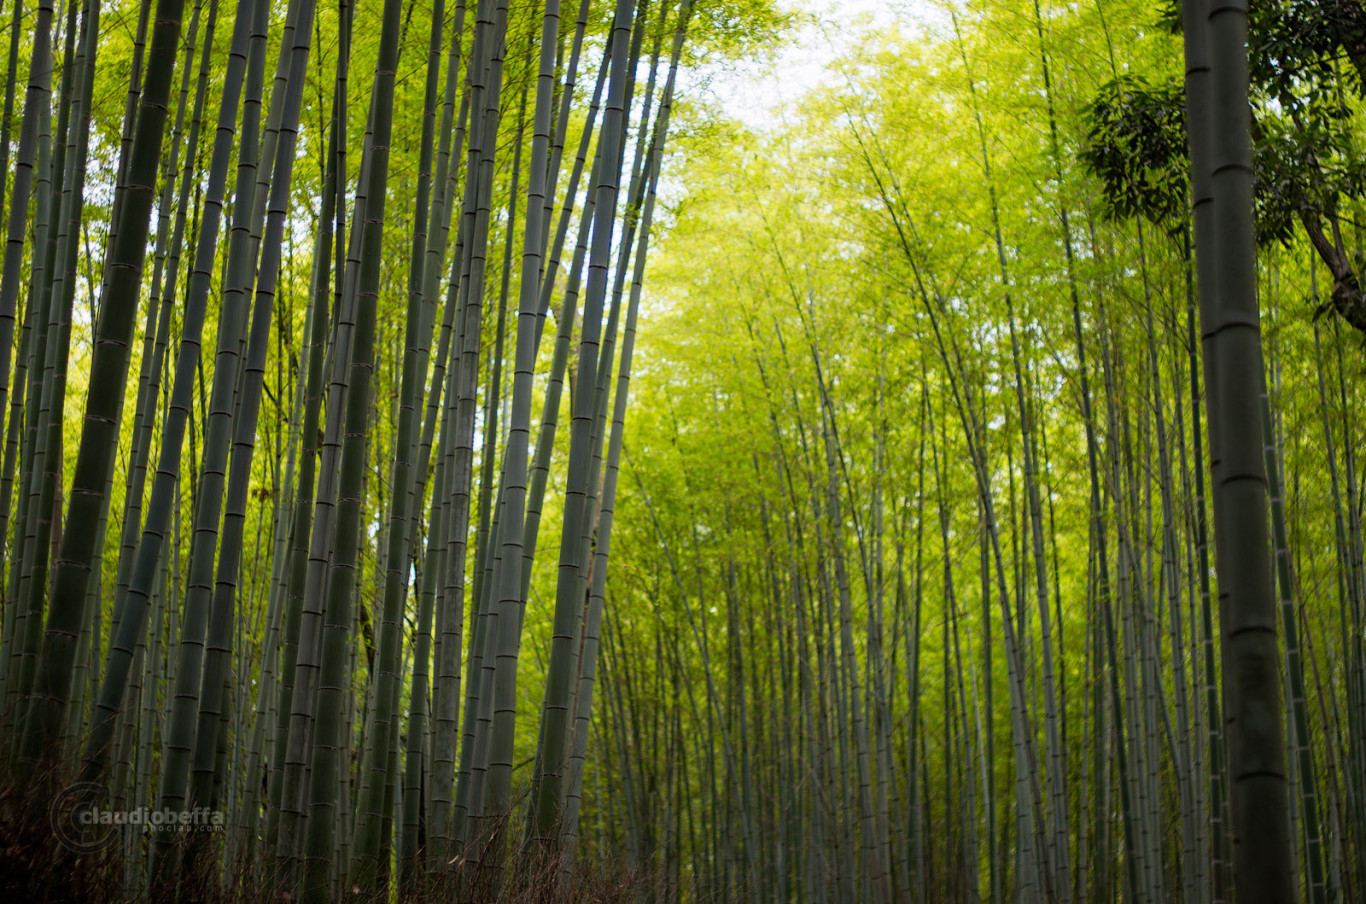 Sagano bamboo